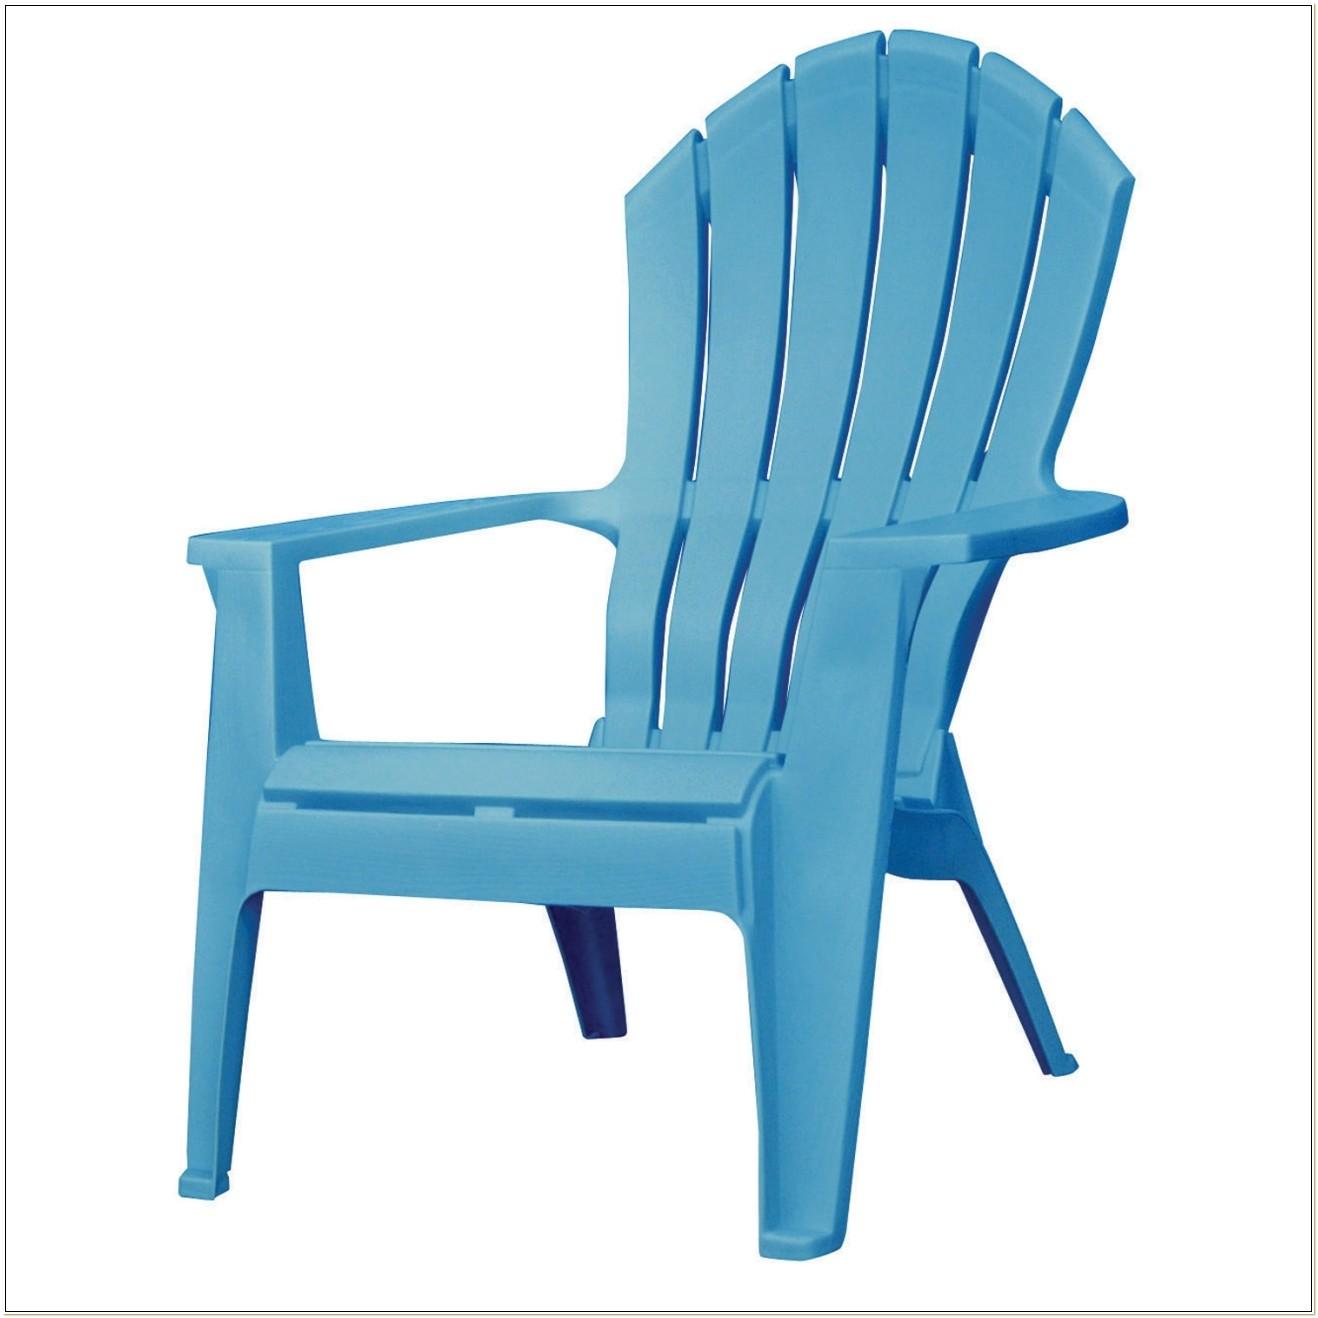 Adams Mfg Ergo Adirondack Chair